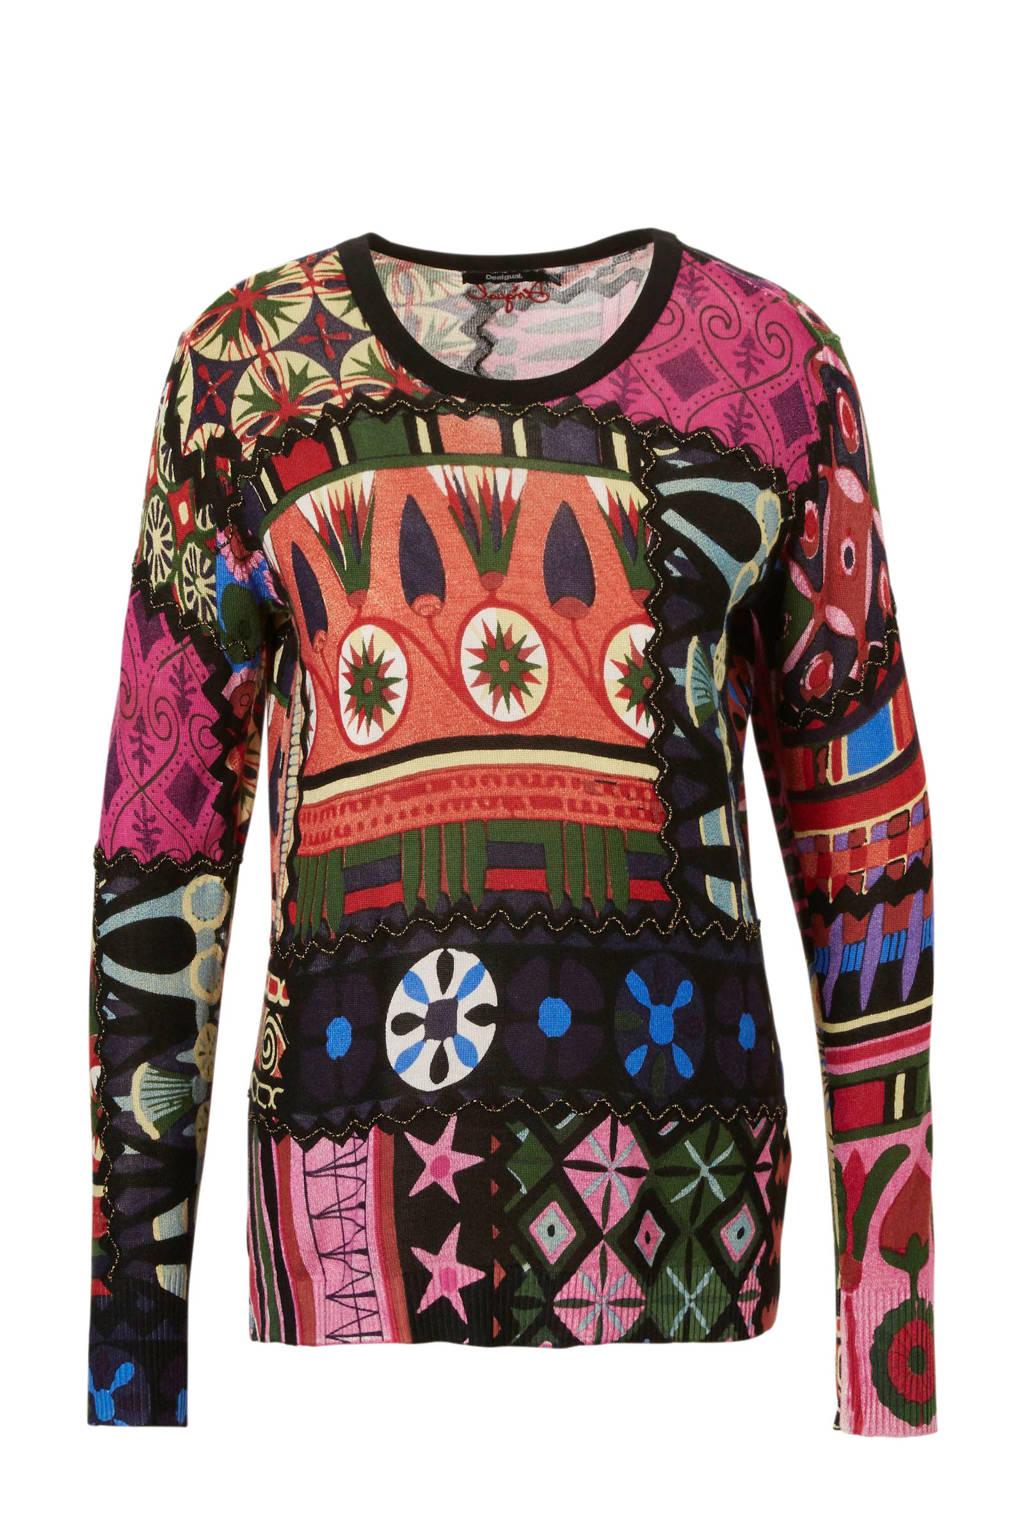 Desigual trui met all over print multi-kleur, Zwart/ Multi-kleur